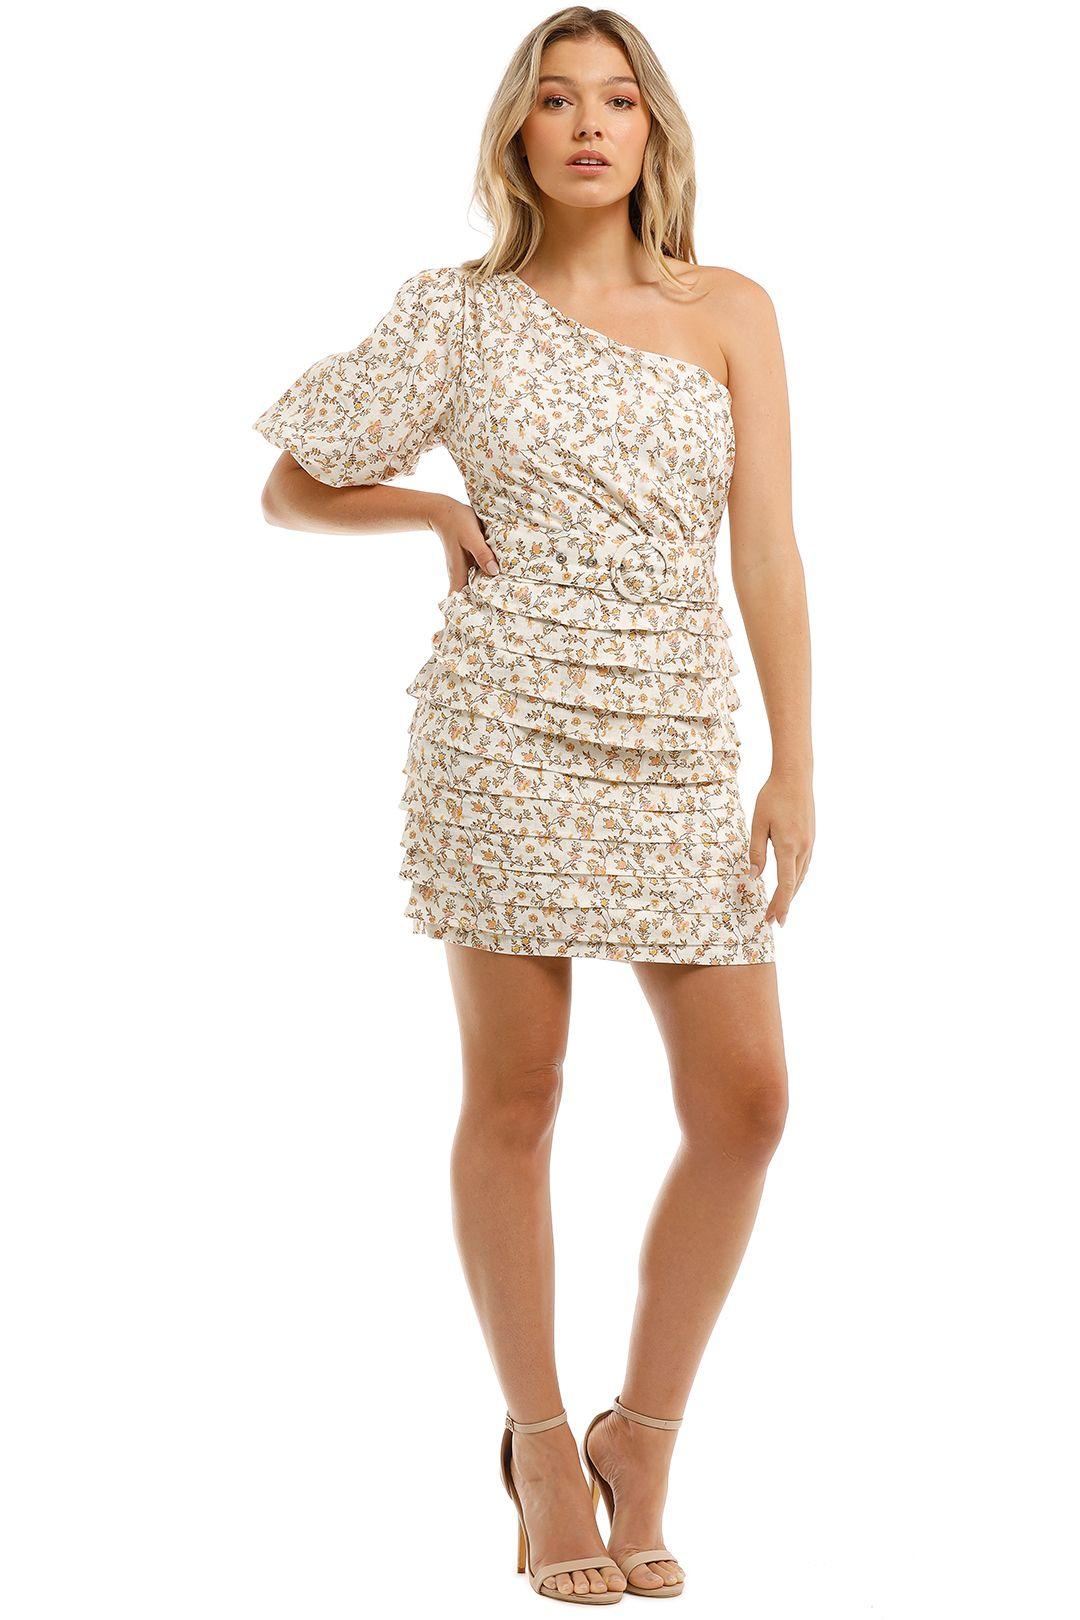 Mink-Pink-One-Shoulder-Puff-Mini-Dress-Front